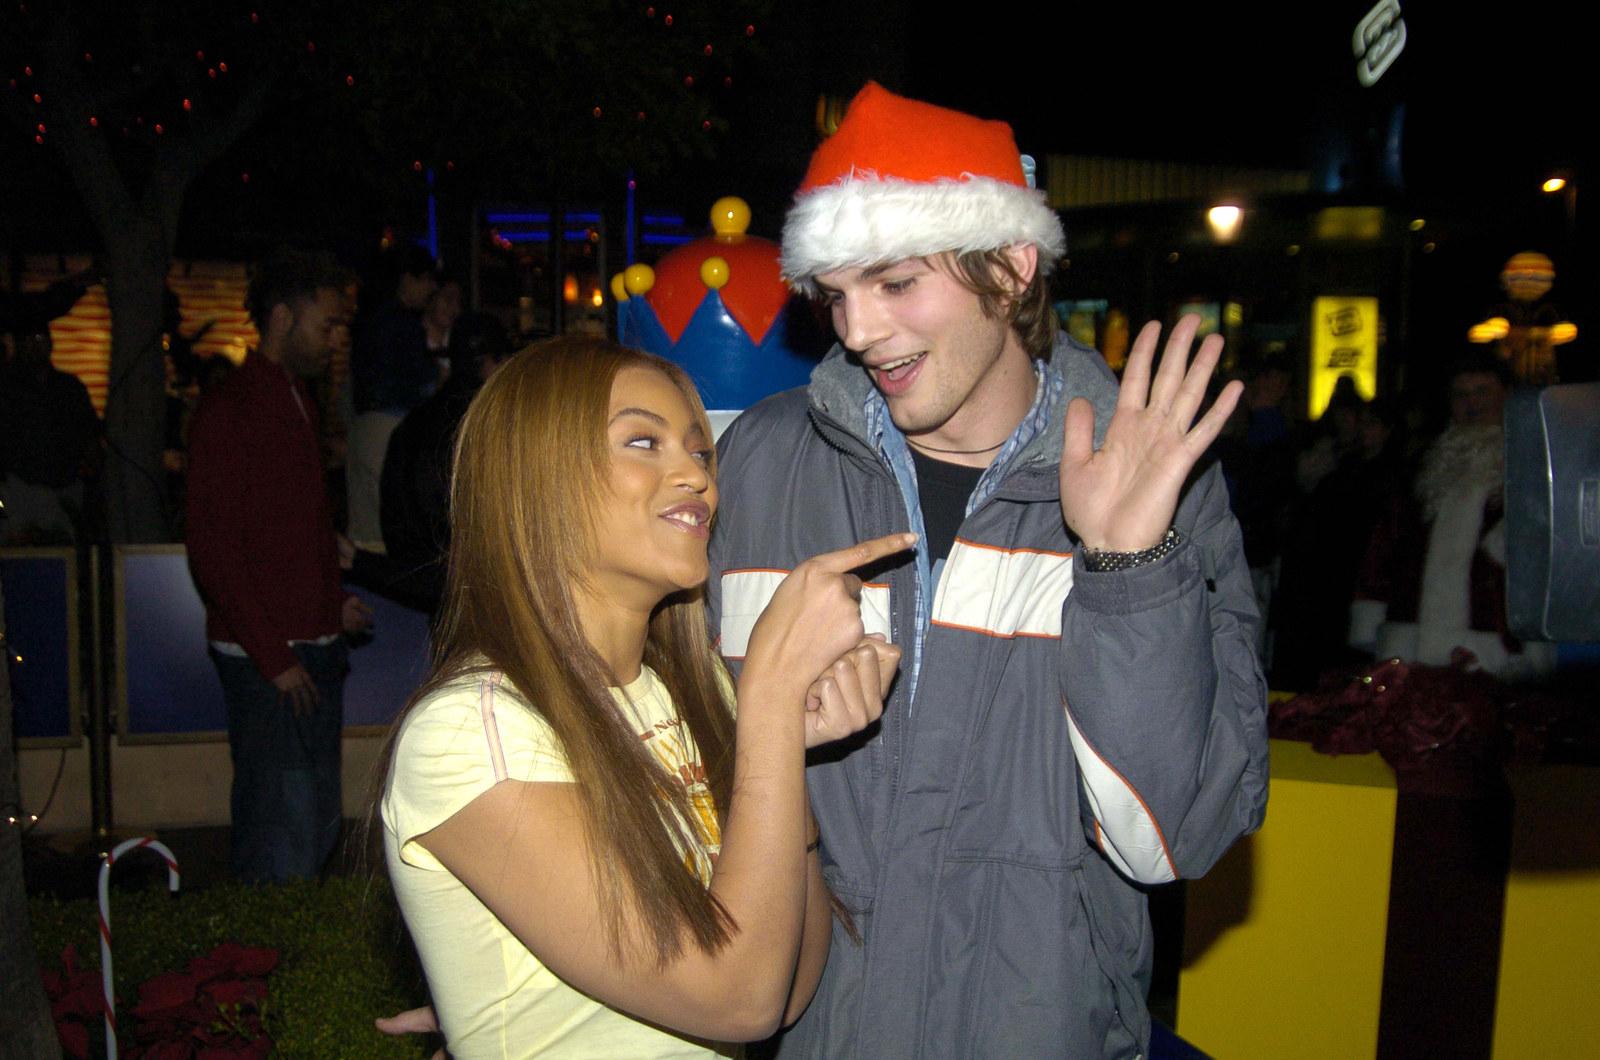 Pointing at Ashton Kutcher's hand.